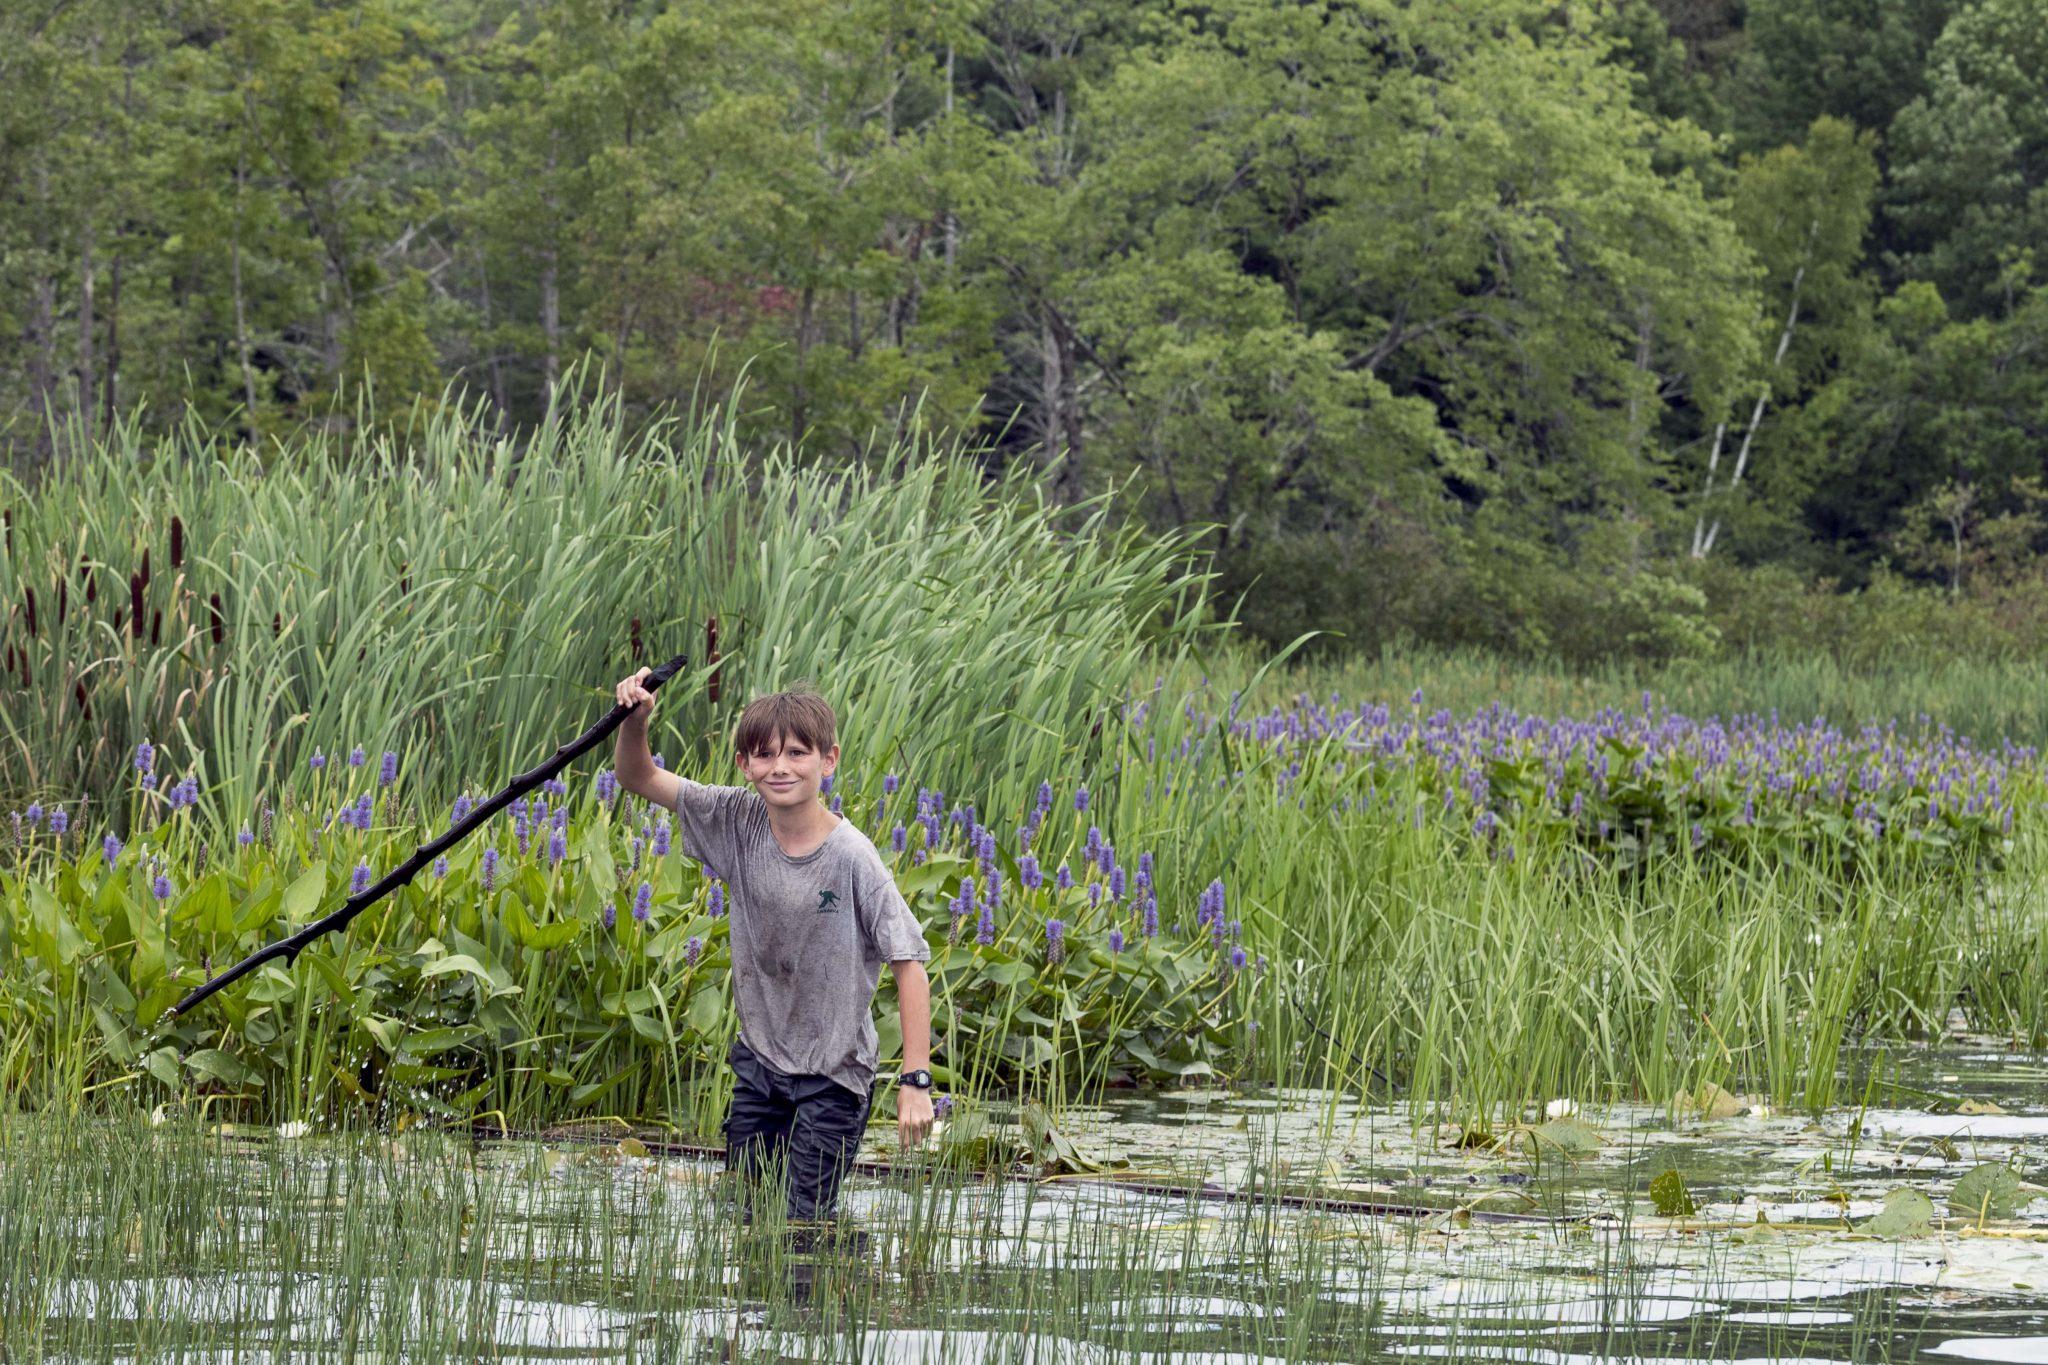 A Lanakila camper walking through the swamp holding a walking stick.